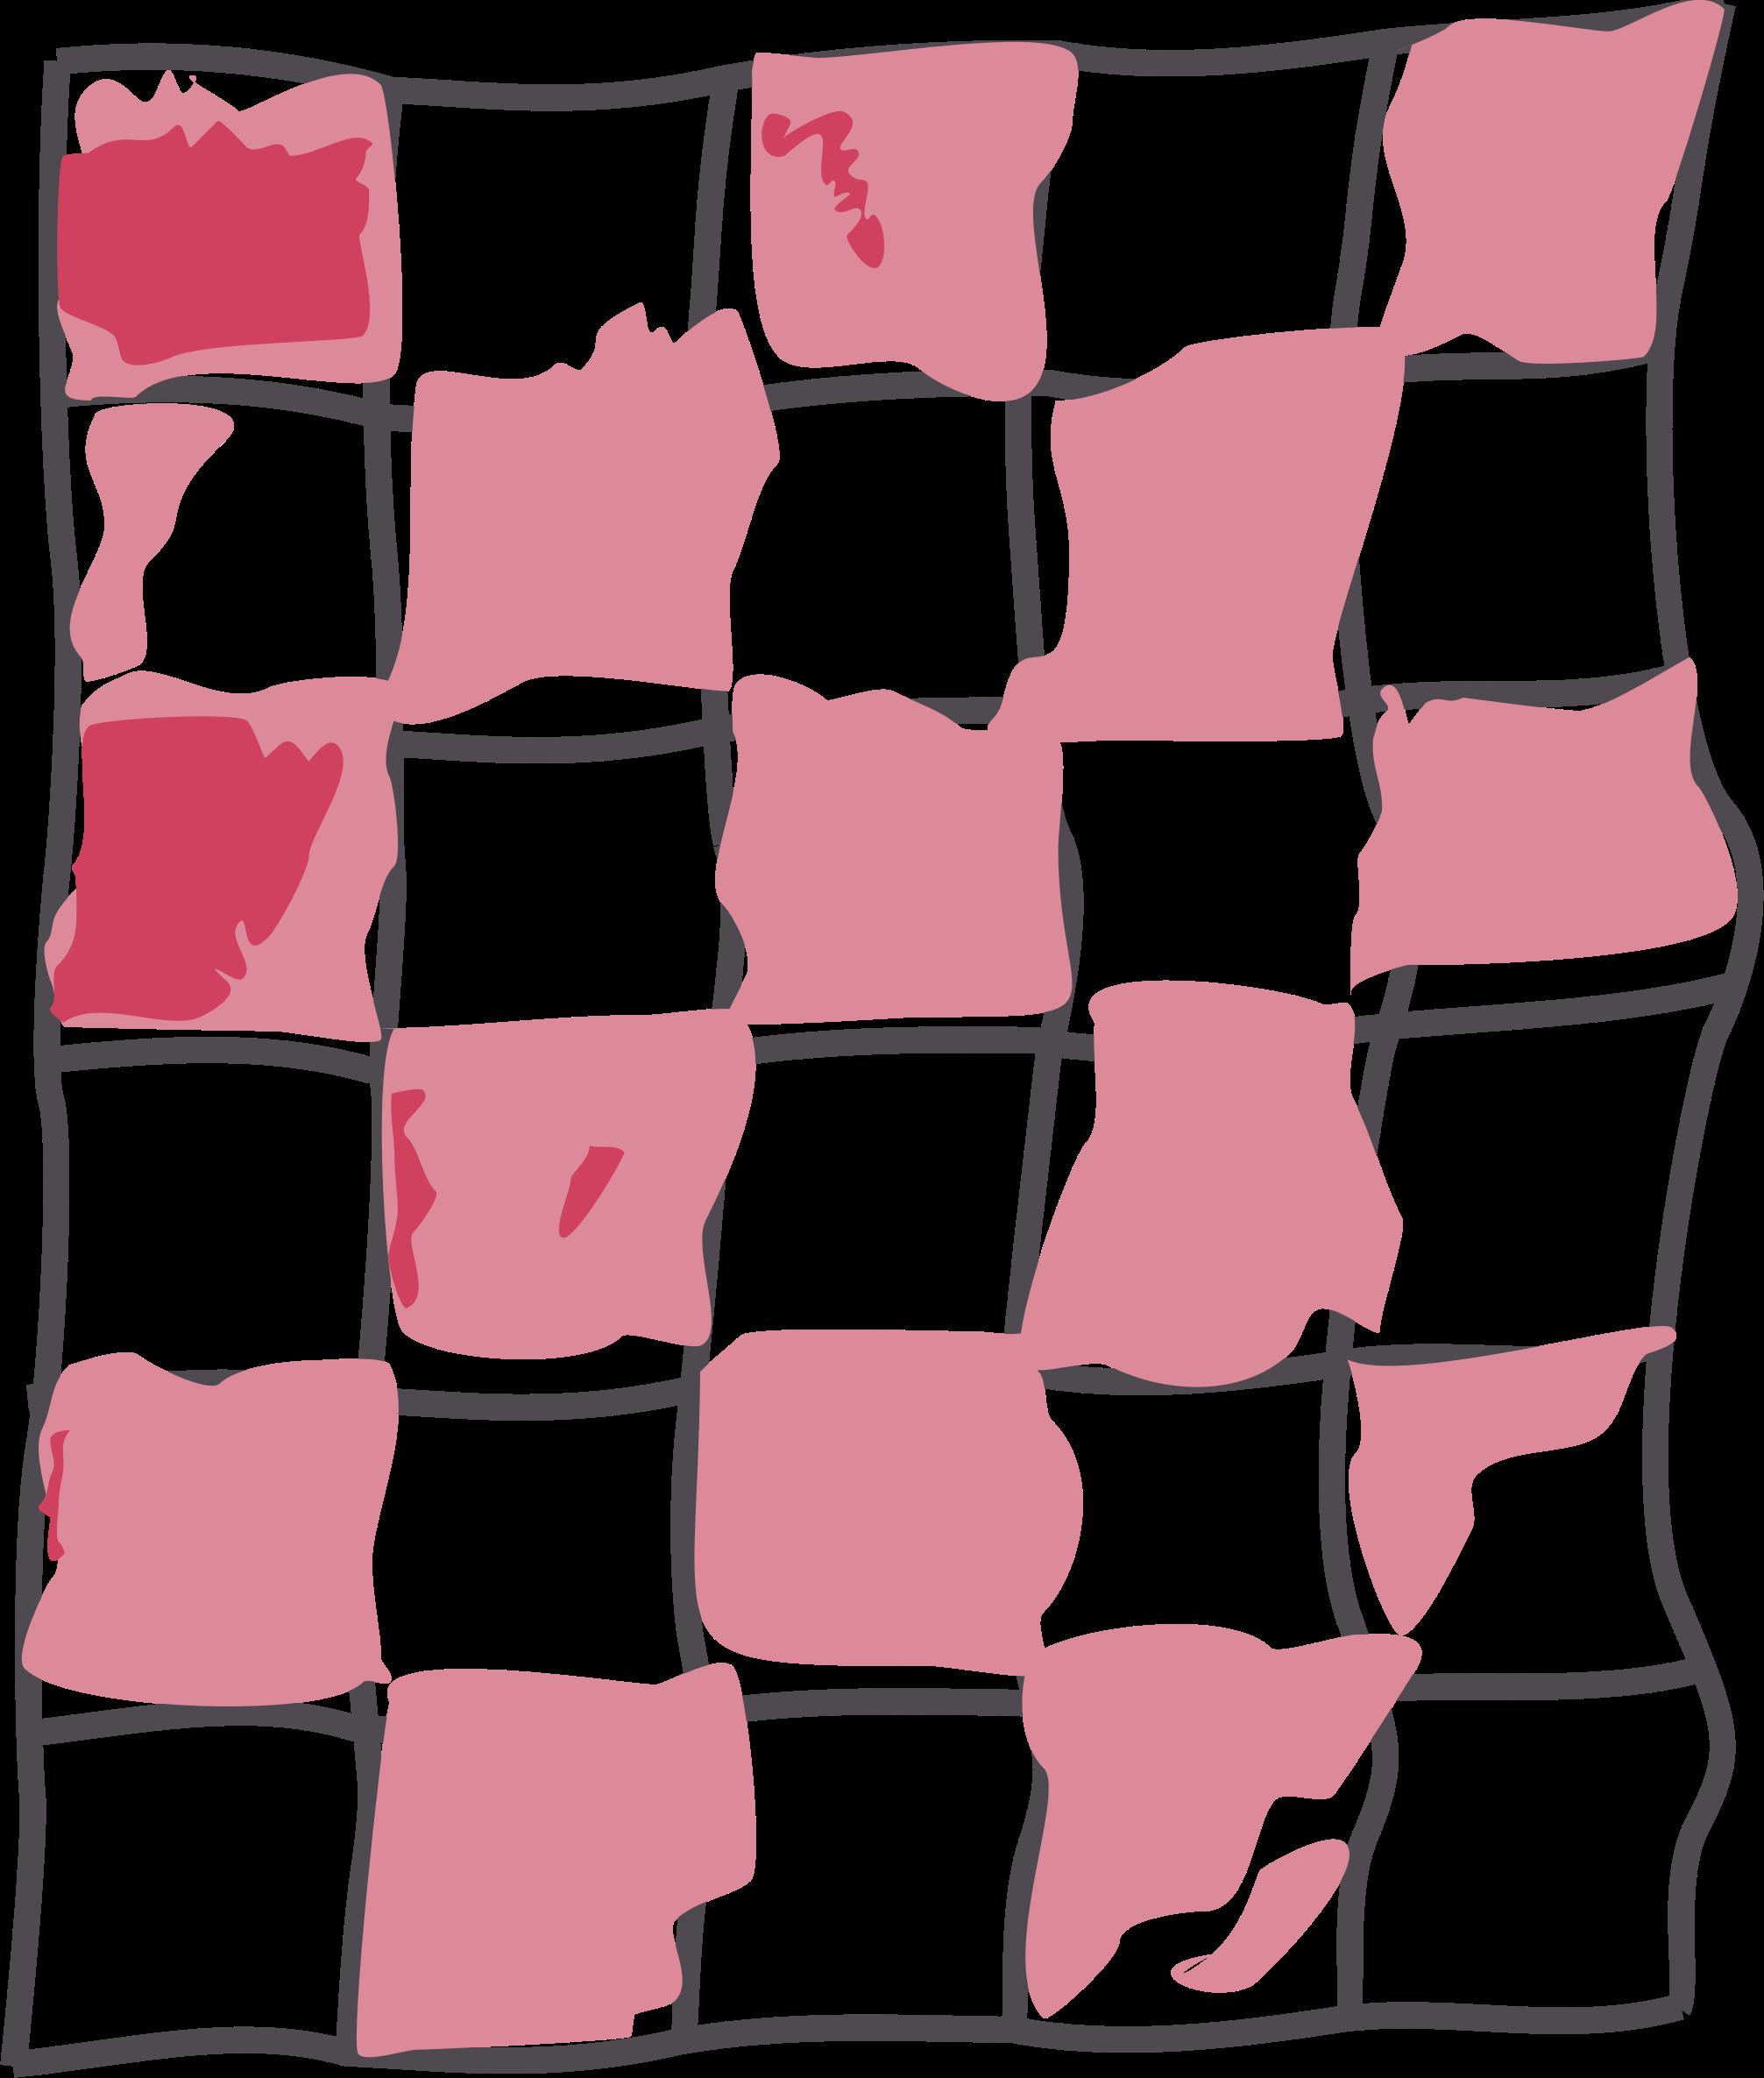 Floor clipart perspective. Wobbly checker board big